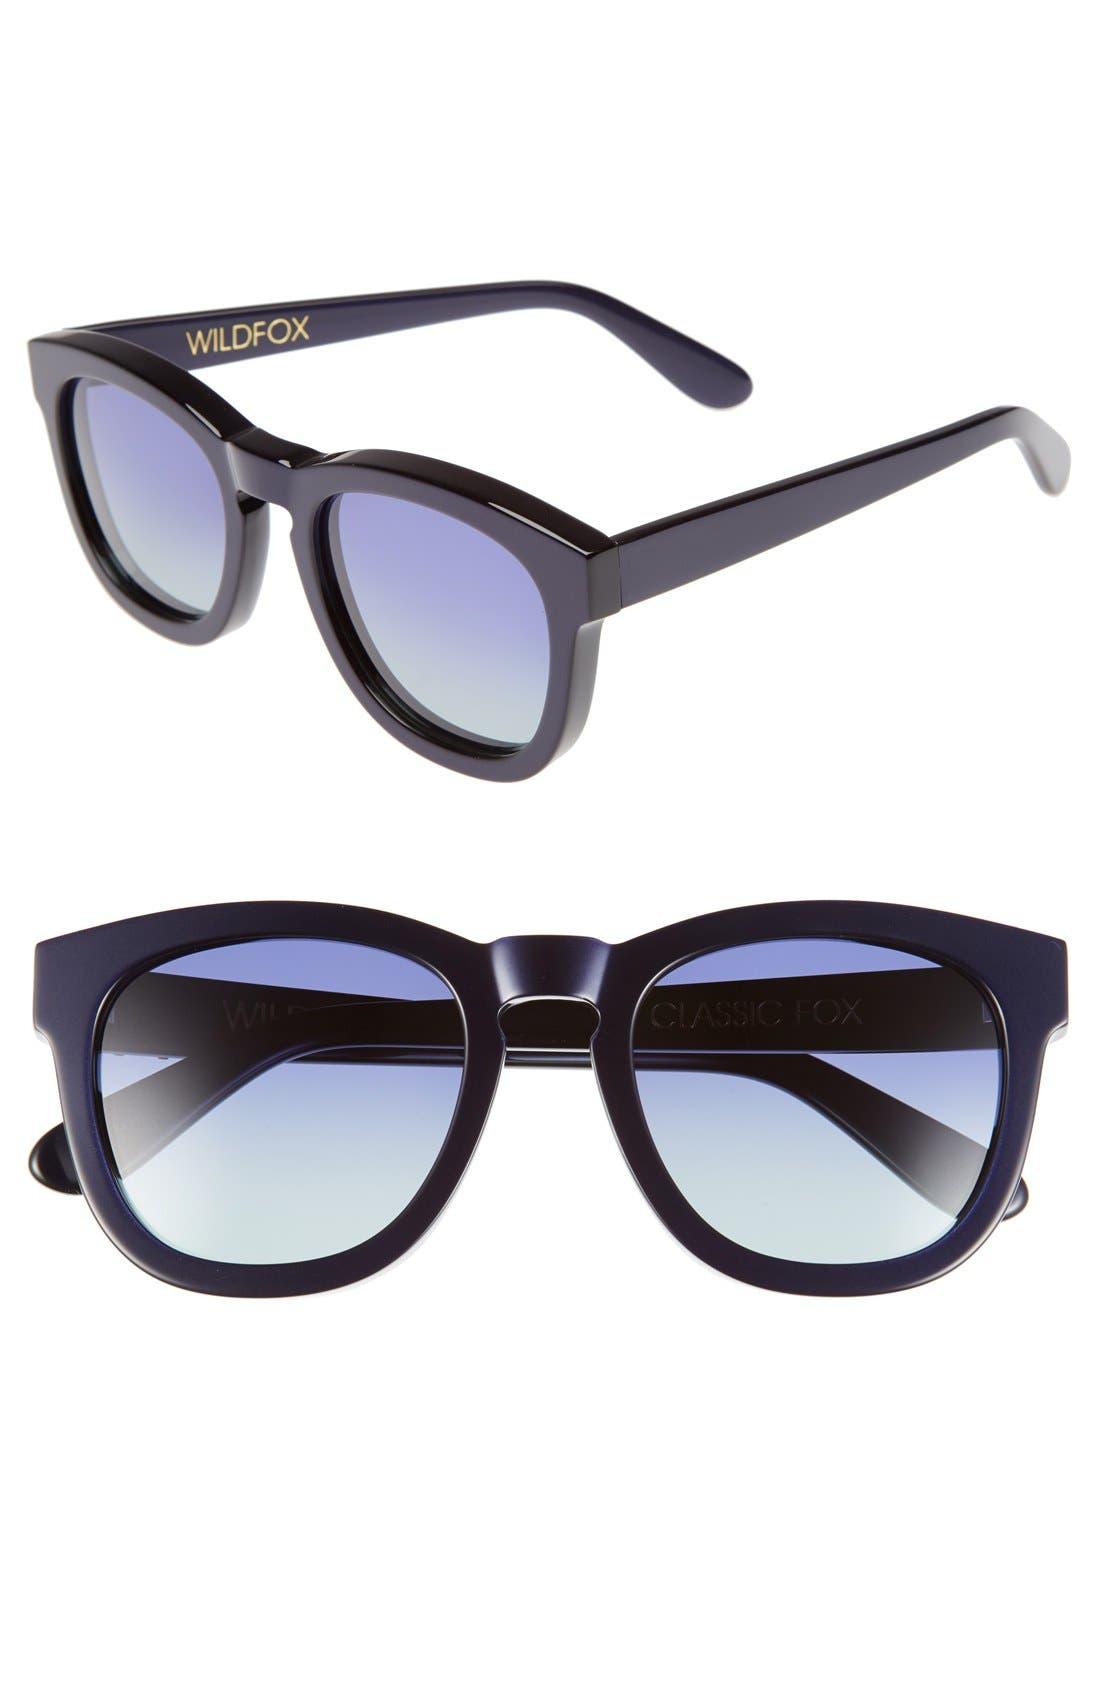 'Classic Fox' 50mm Retro Sunglasses,                             Main thumbnail 14, color,